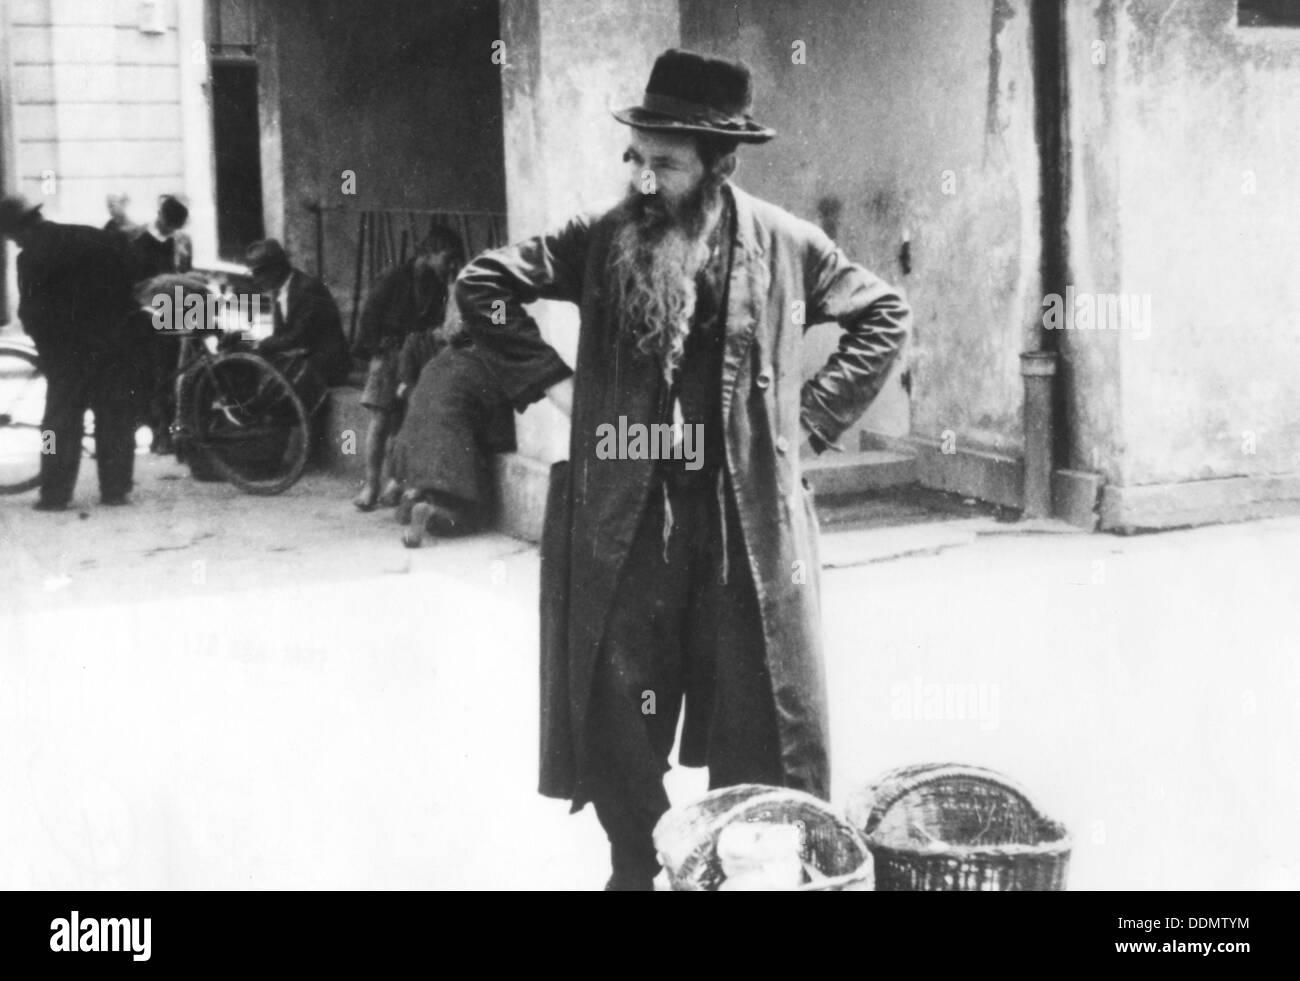 Jewish peddler selling potatoes, Warsaw Ghetto, Poland, World War II, 1940-1945. - Stock Image